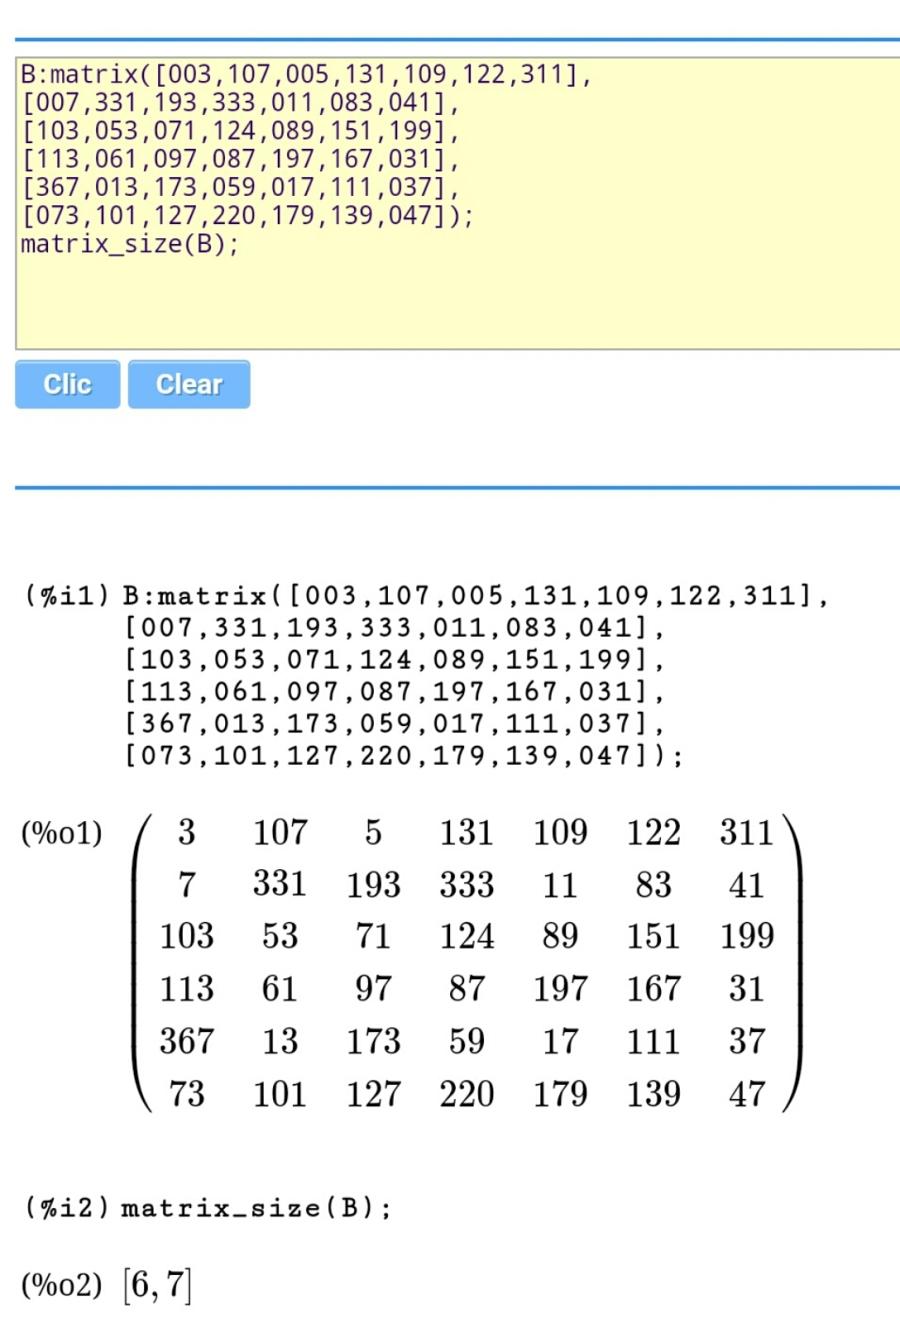 matrix_size